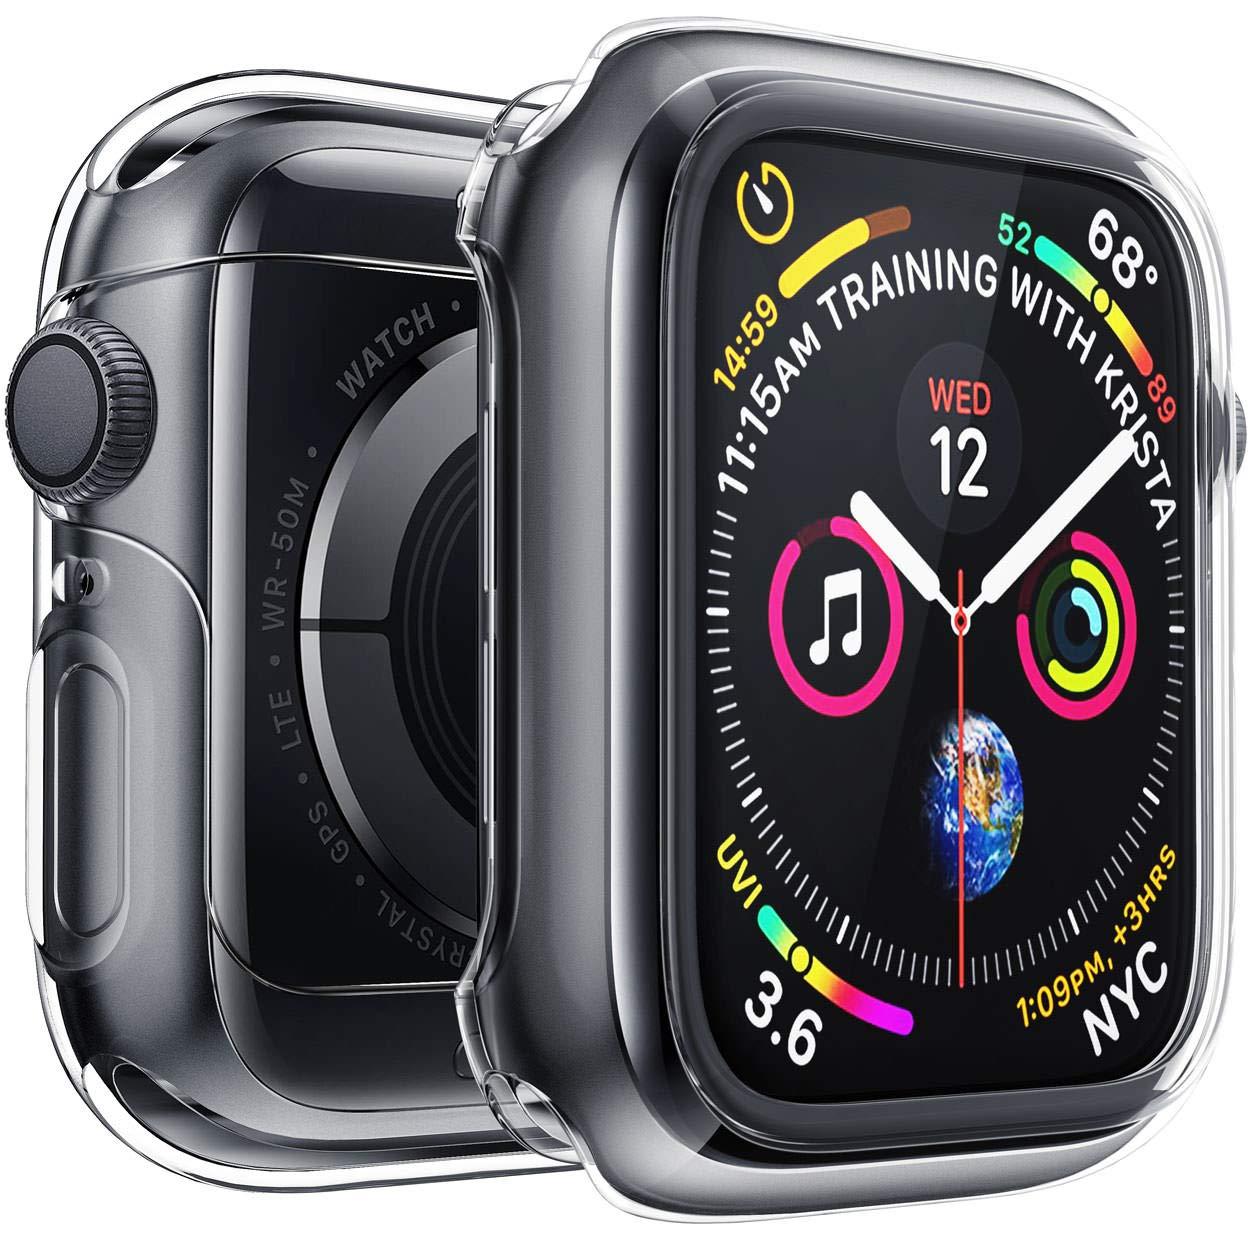 Protector Para Reloj Apple Watch Series 3 2 1 (42mm)